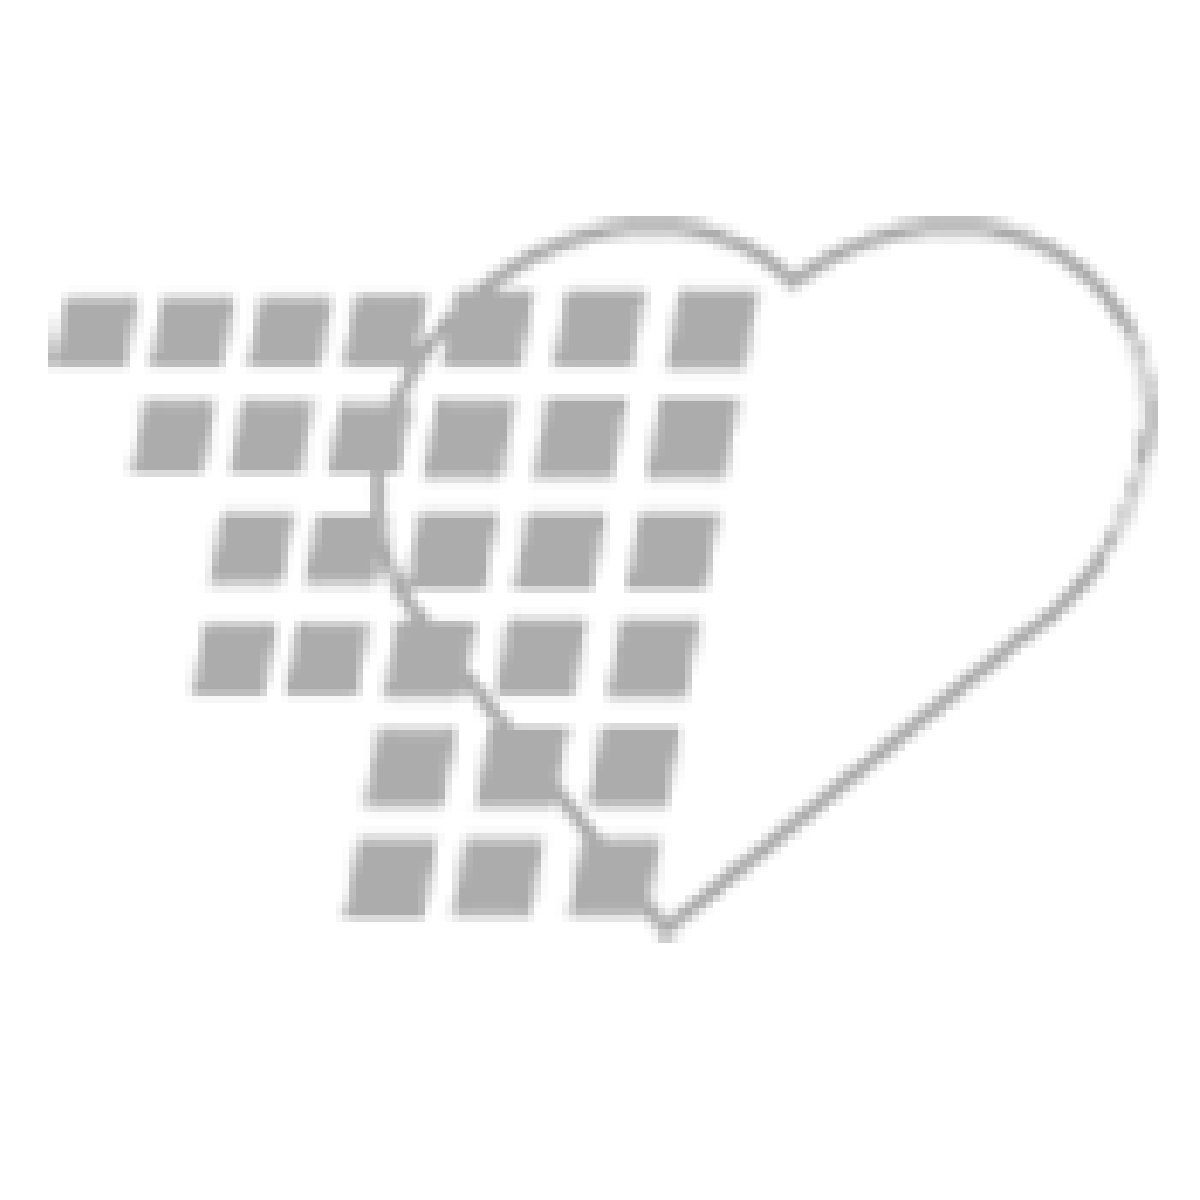 06-93-1123 Demo Dose® Sodim Bicrb 8.4% Pediatric 10mL